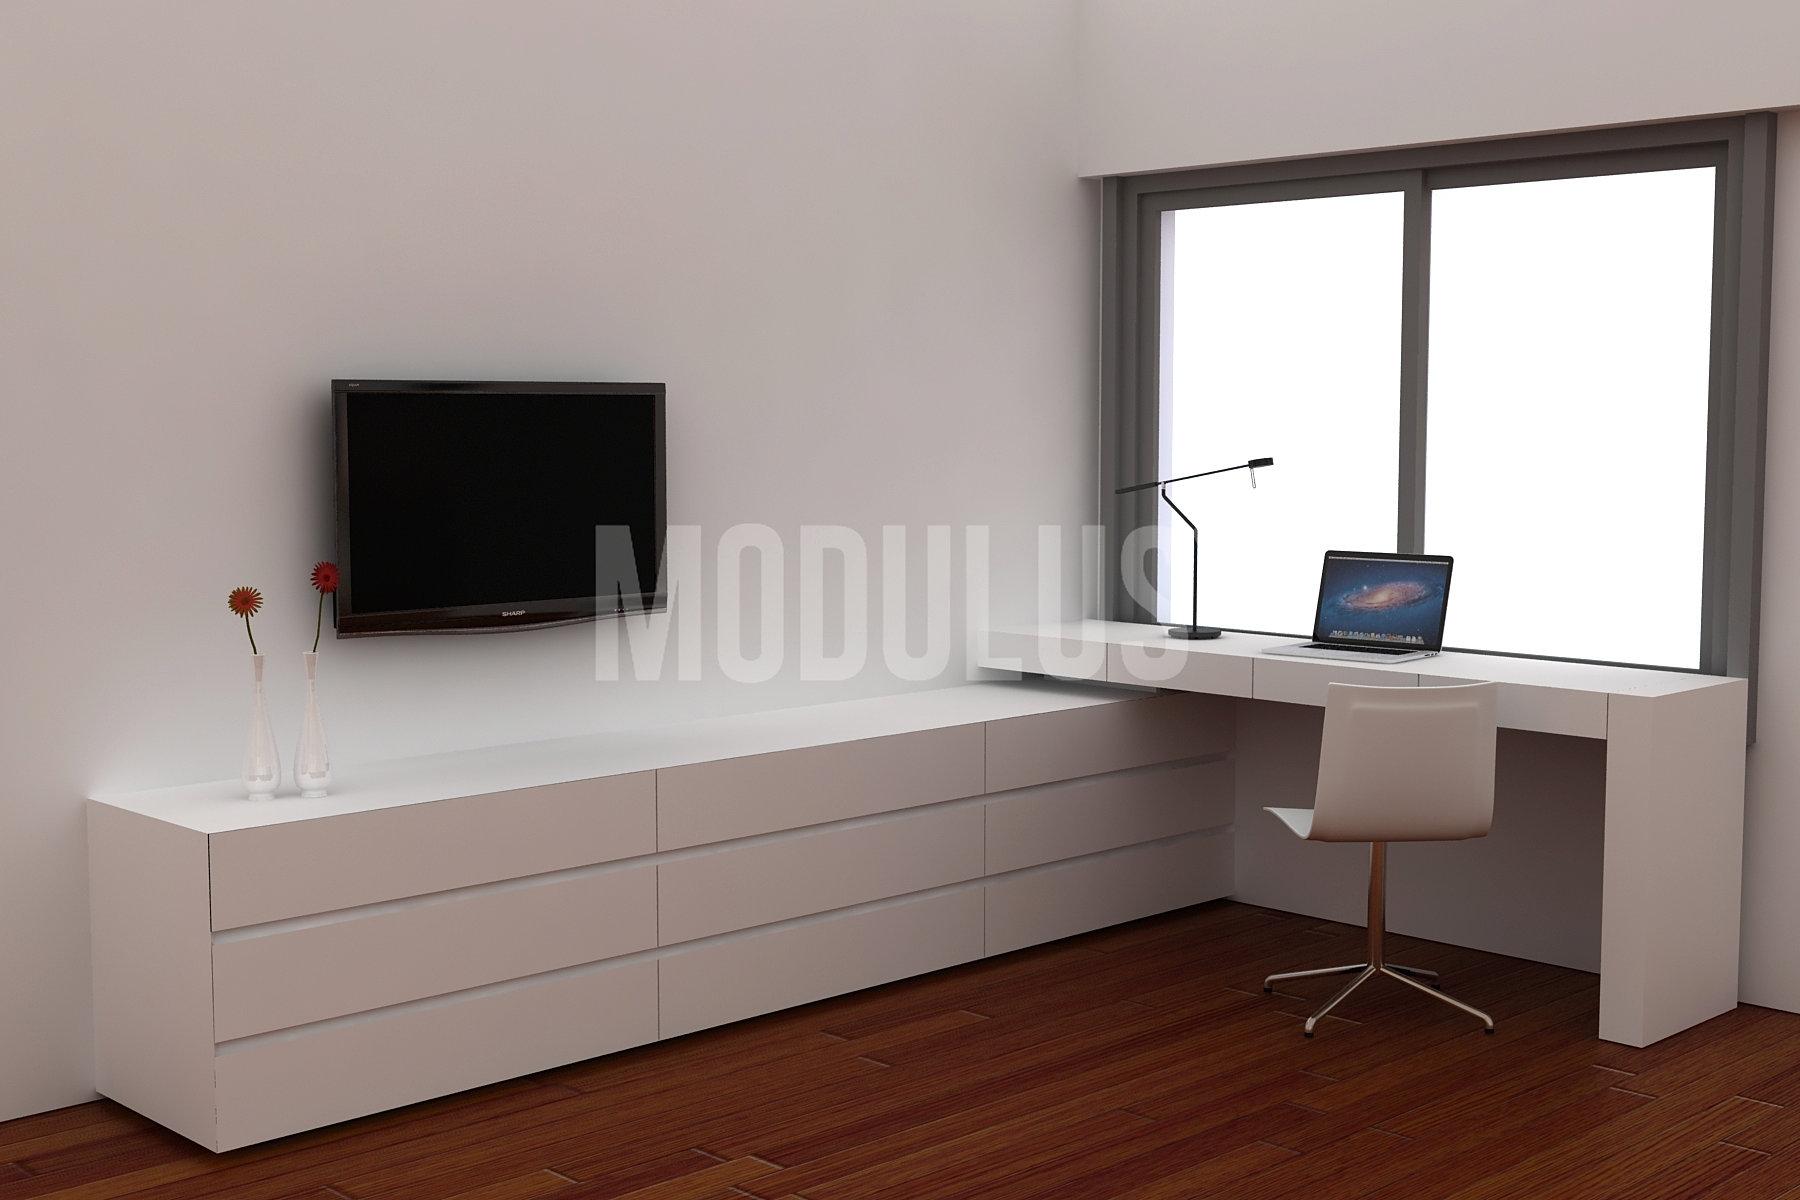 Modulus muebles de diseño  ESCRITORIO / COMODA